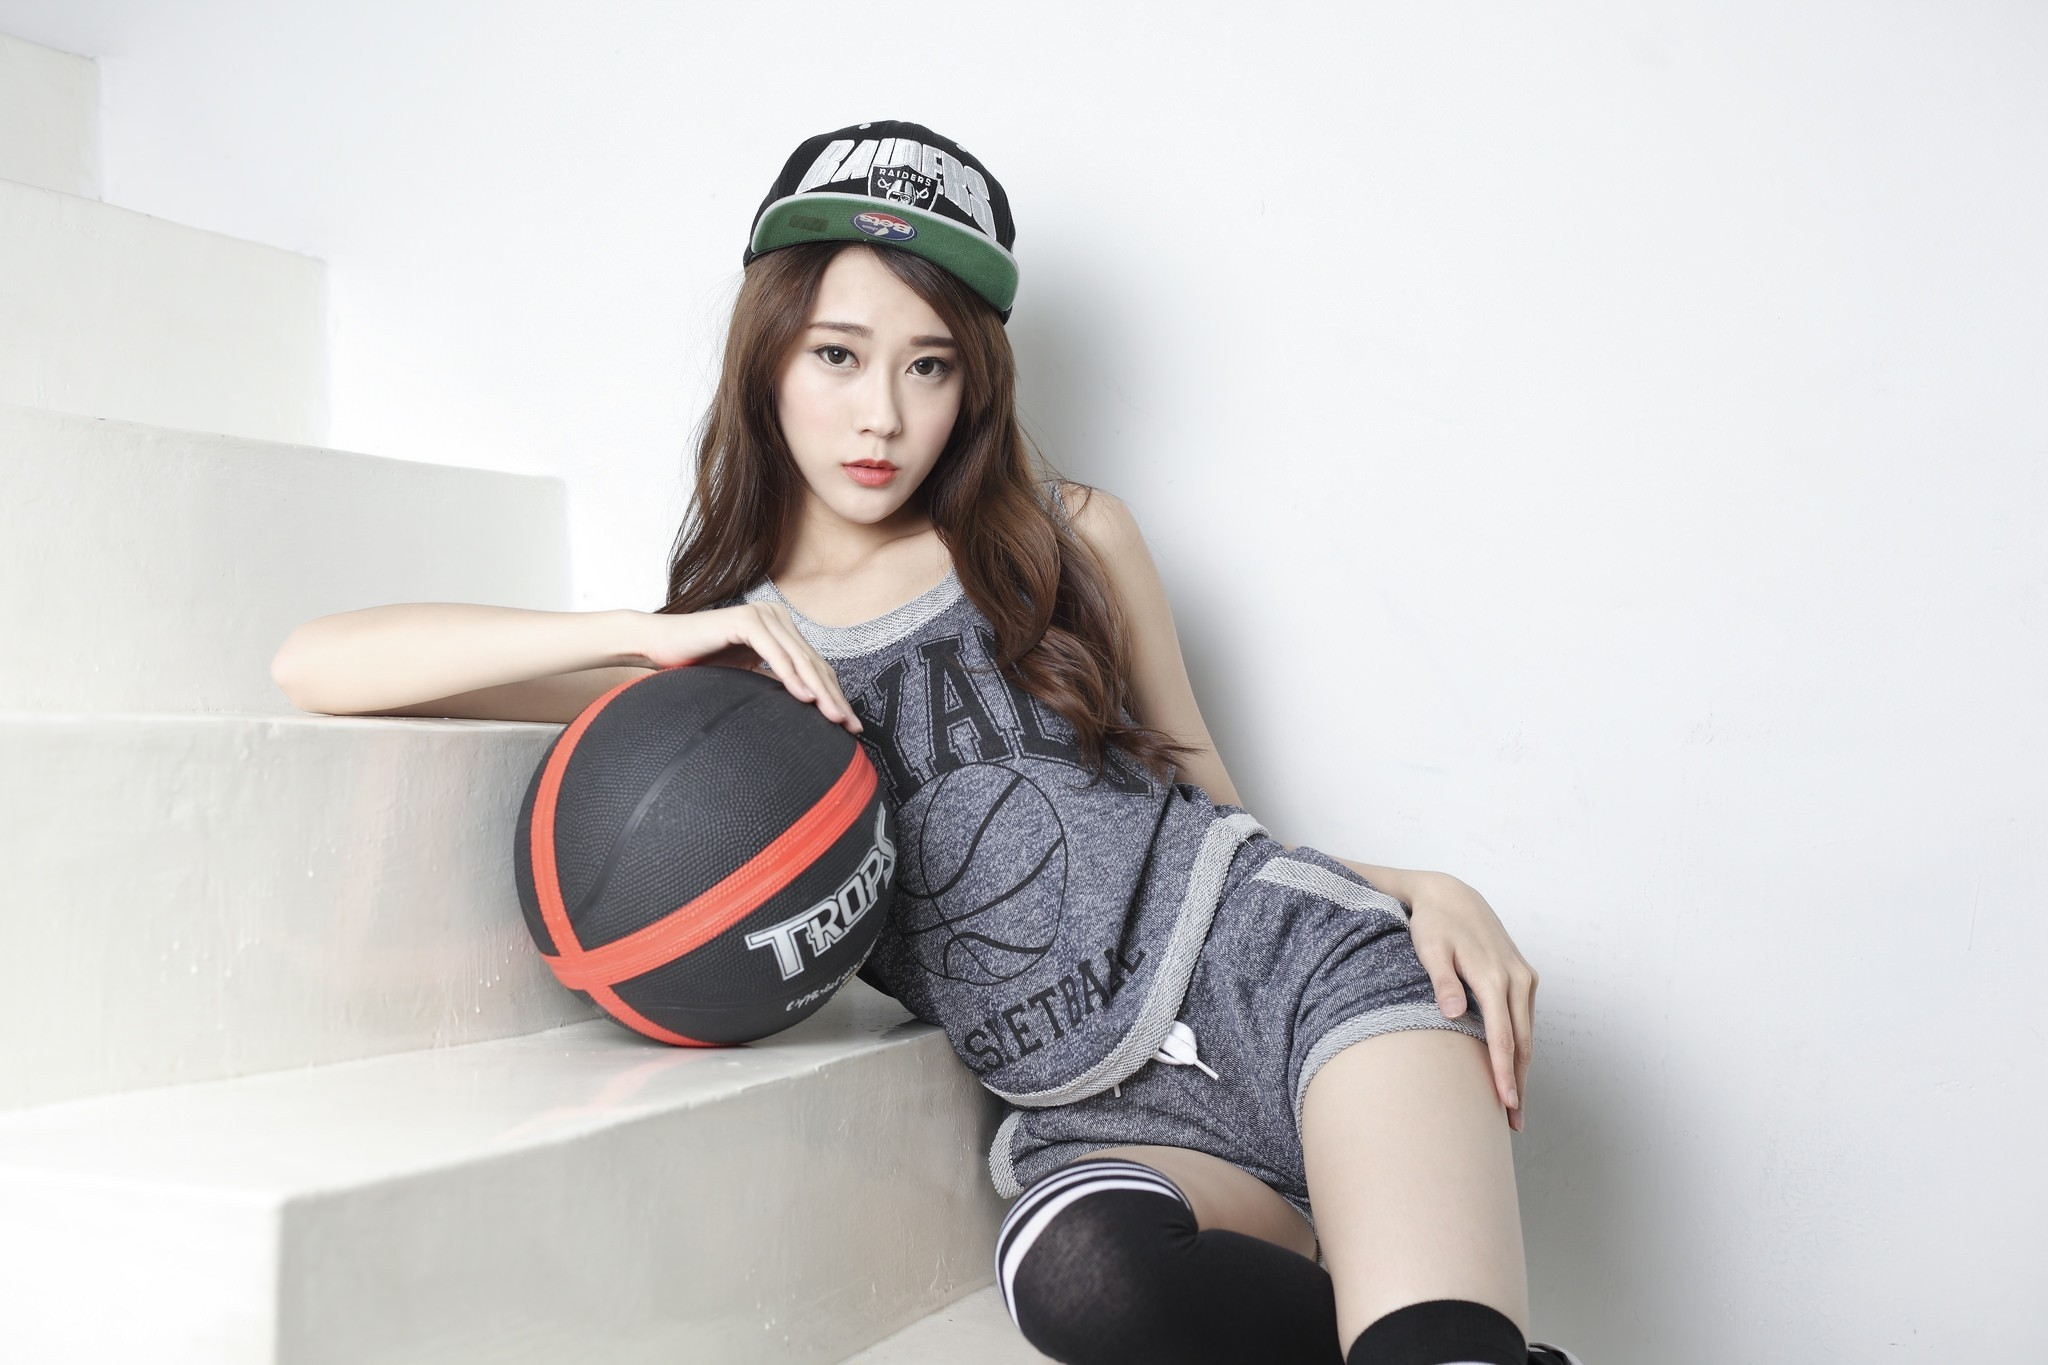 Asian Model, Women, Stairs, Basketball, Hat, Cute